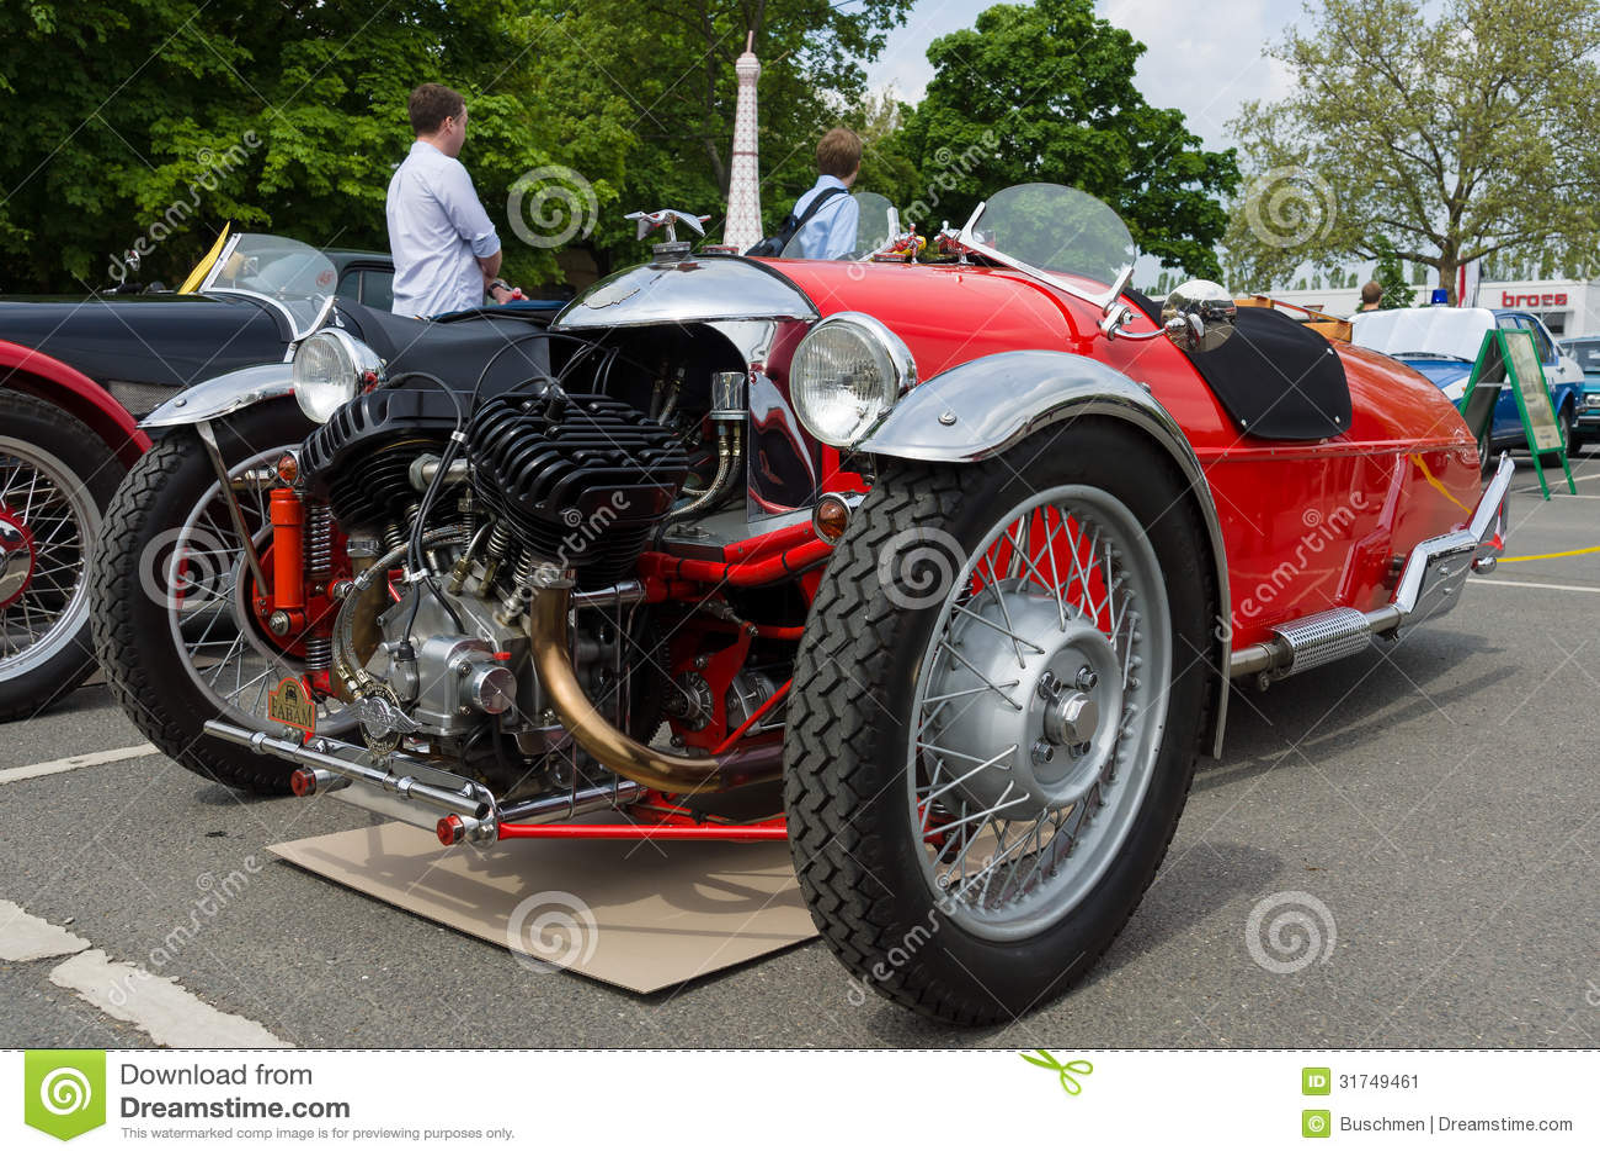 car morgan v twin three wheelers editorial photo image 31749461. Black Bedroom Furniture Sets. Home Design Ideas